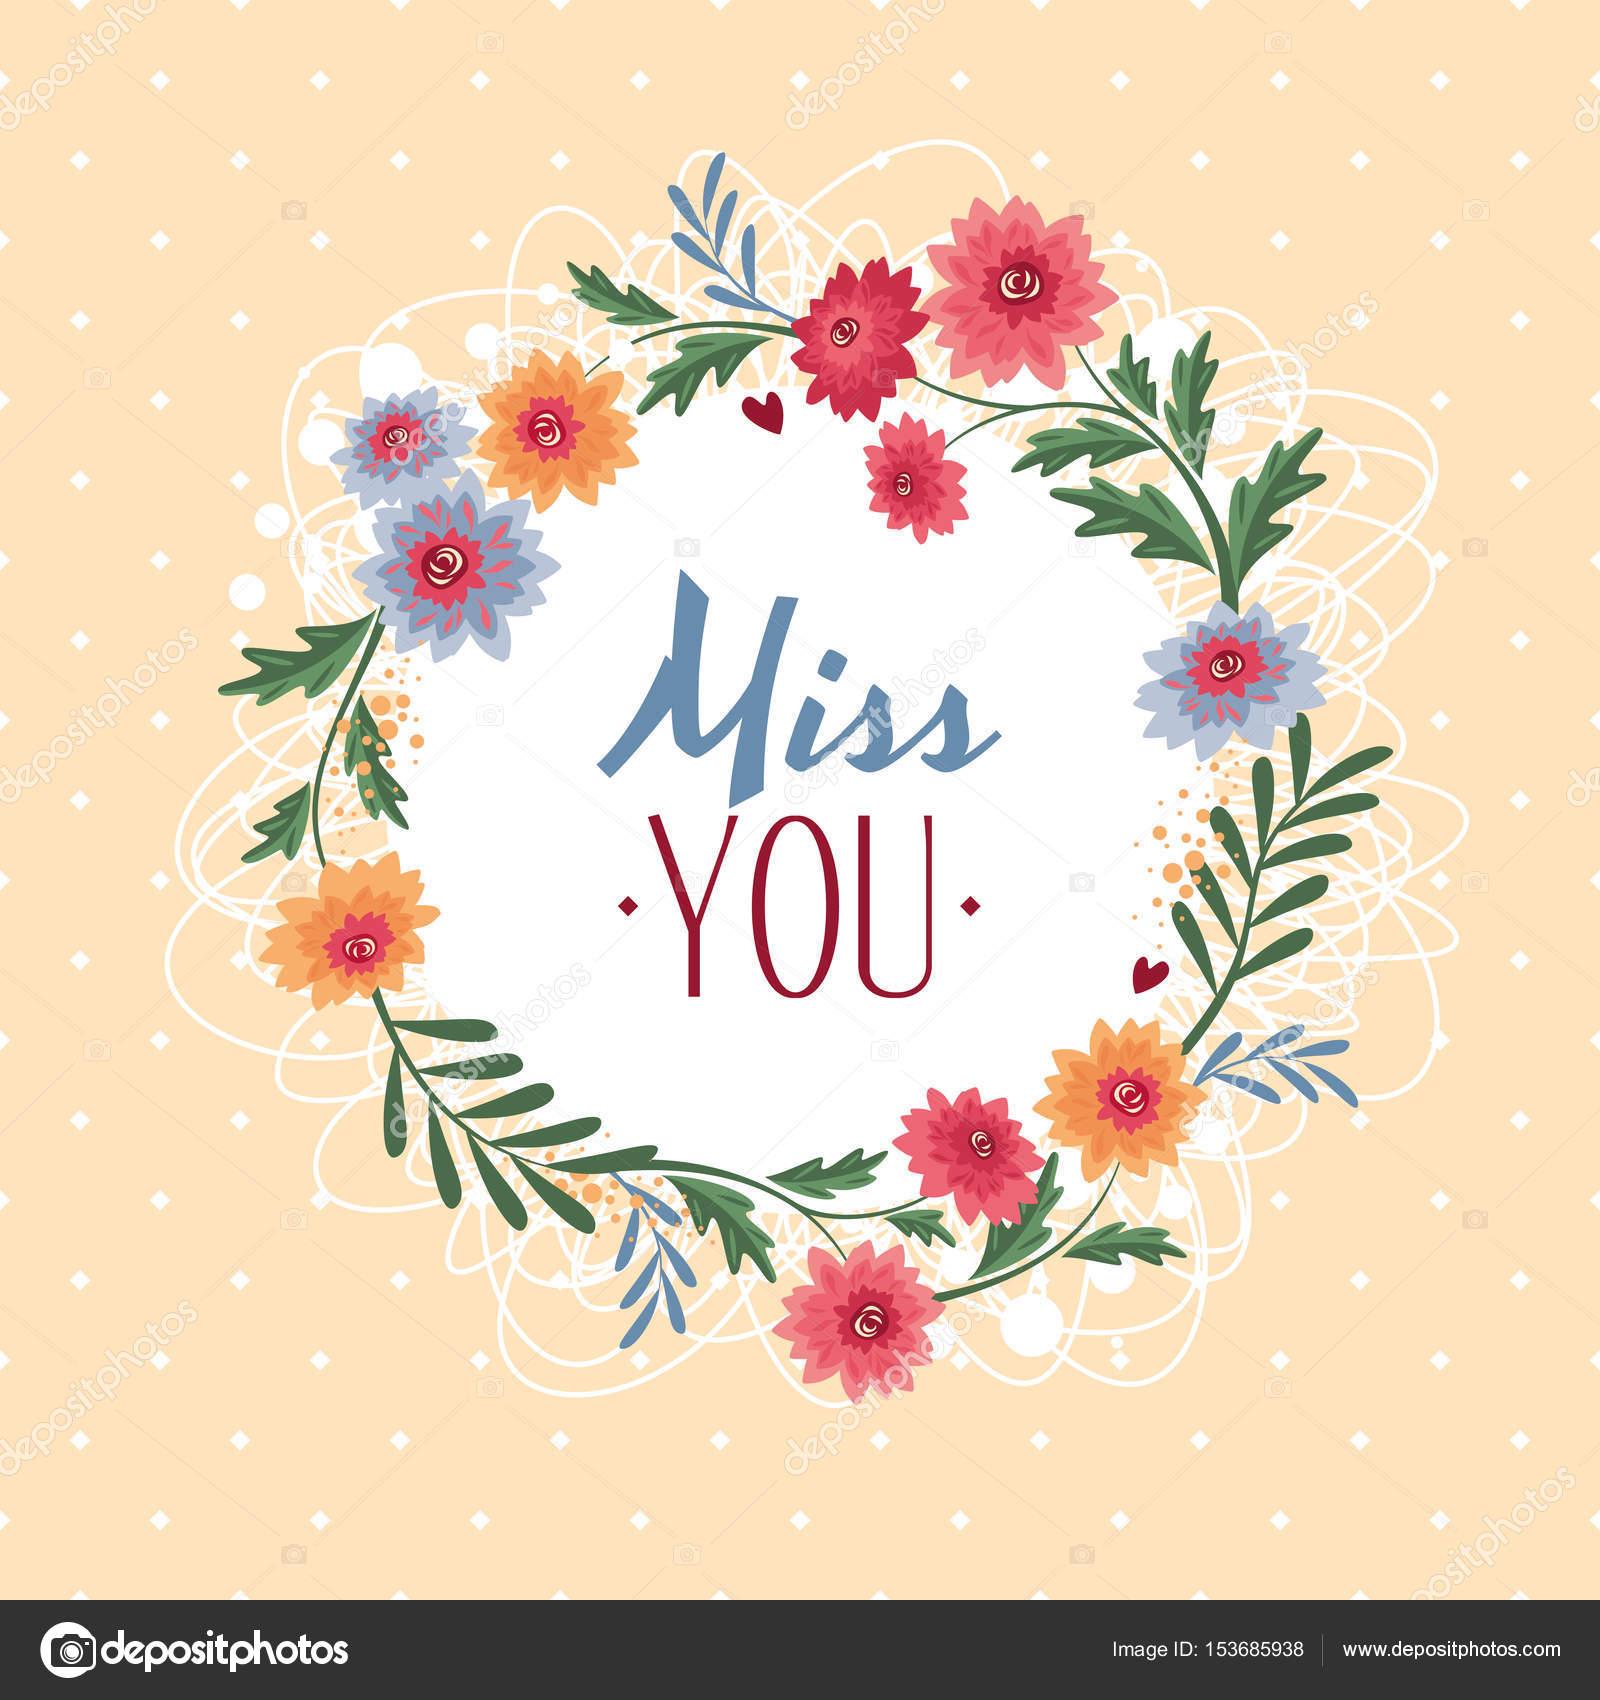 Miss you gift card stock vector selenamay 153685938 miss you gift card stock vector kristyandbryce Image collections